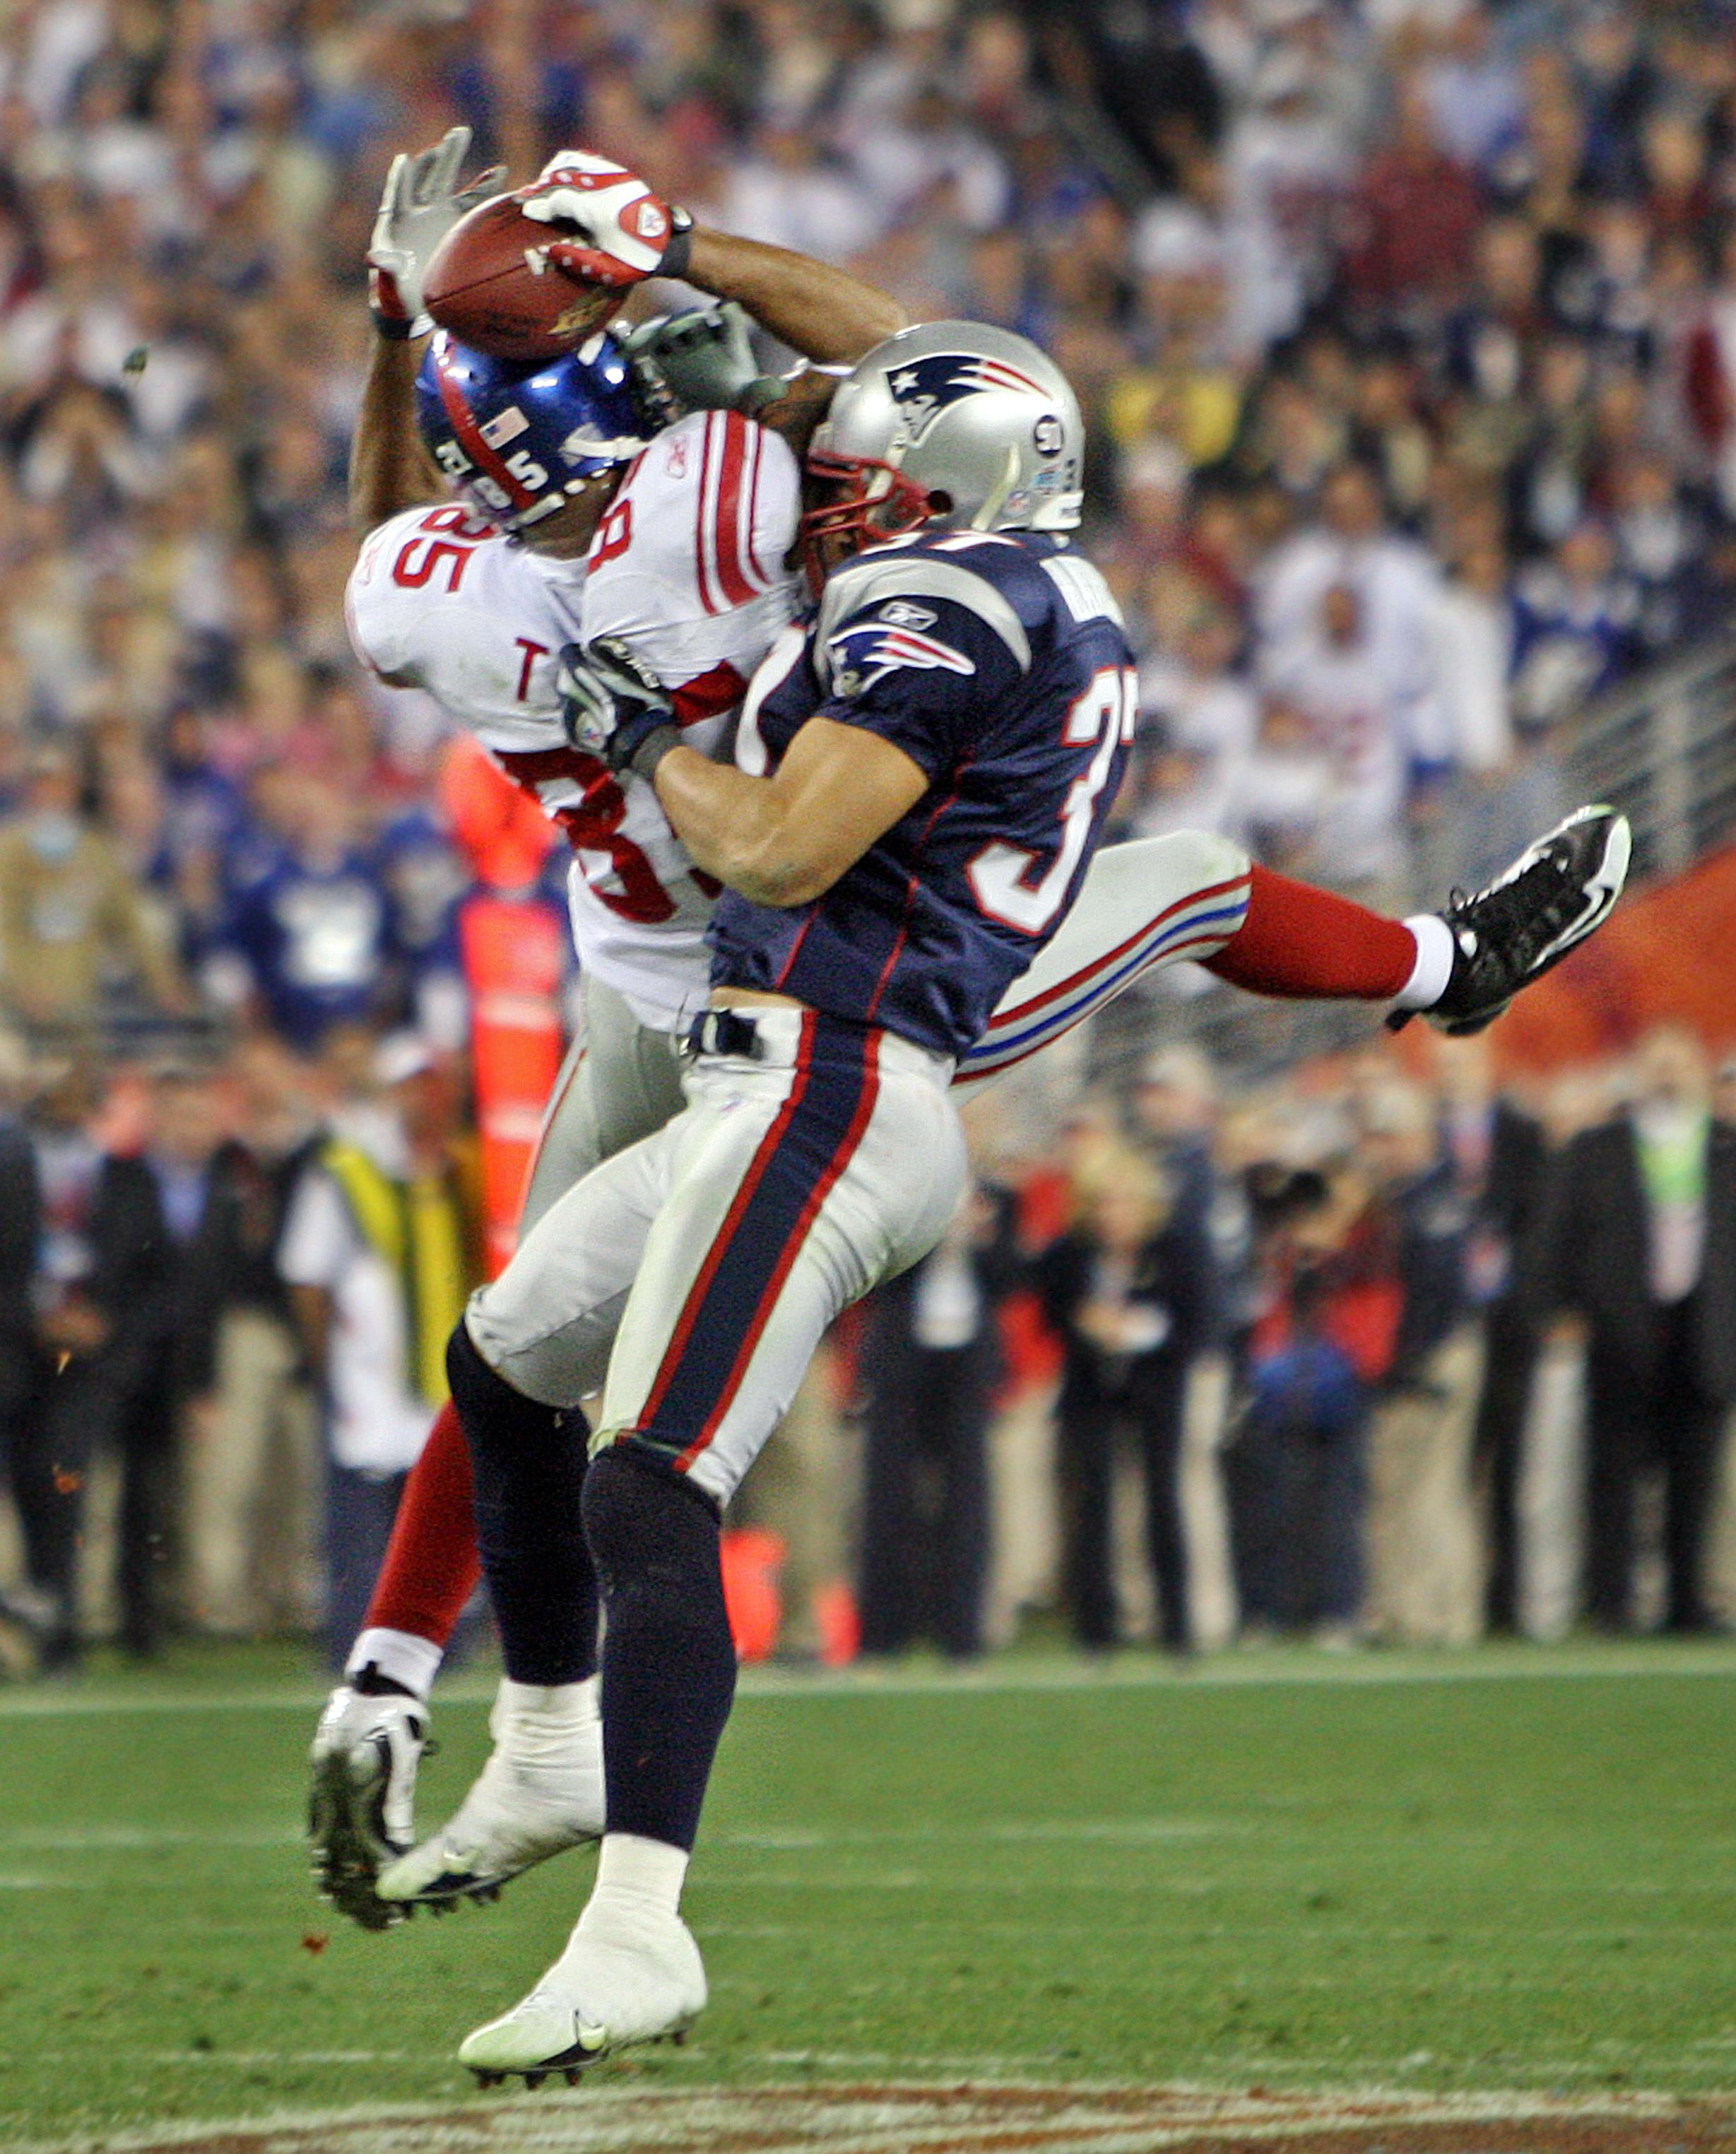 Super Bowl XLII: New England Patriots Vs. New York Giants